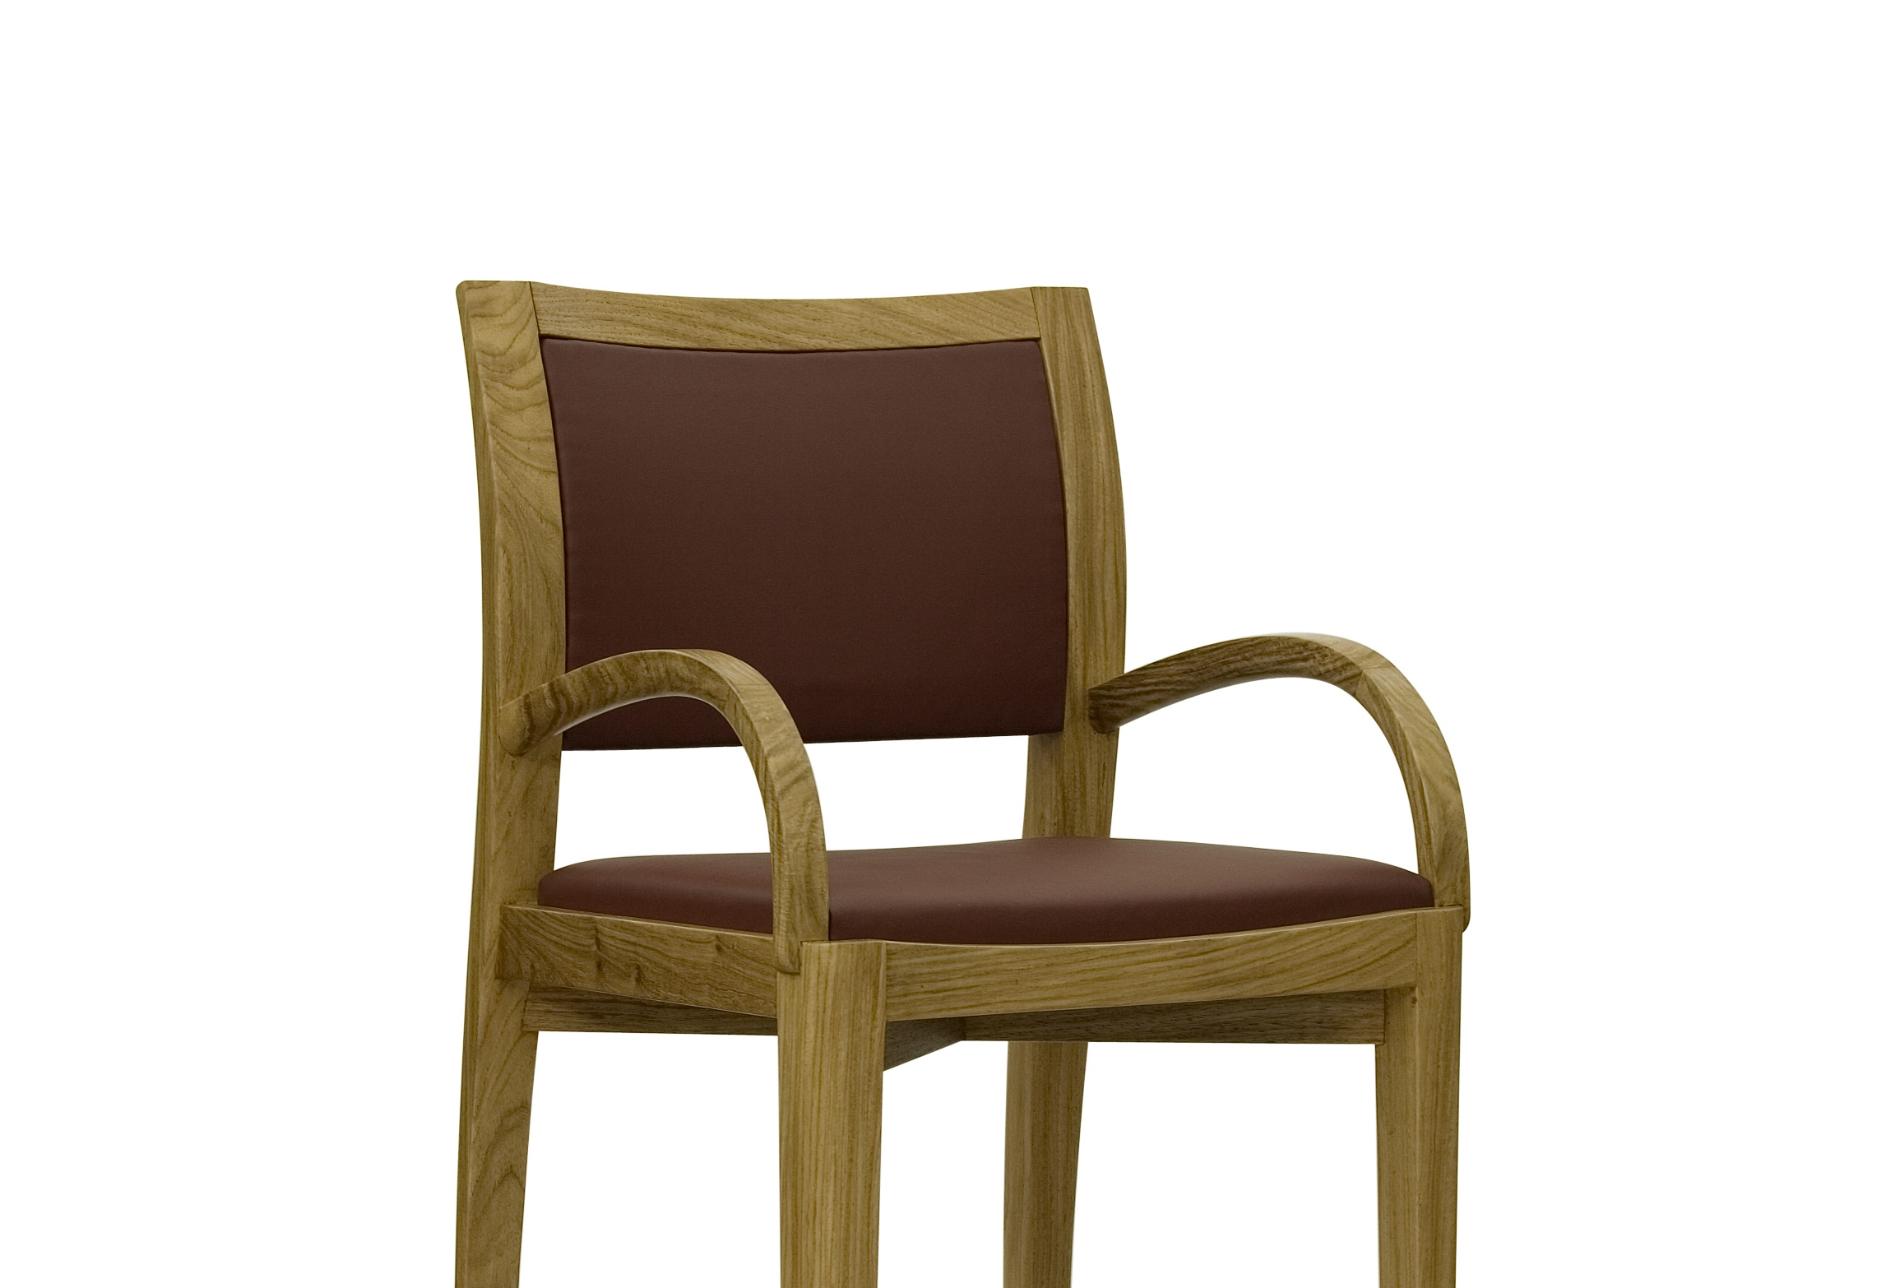 ....Bespoke Modern furniture : High chair..特别定制现代家具: 高椅....